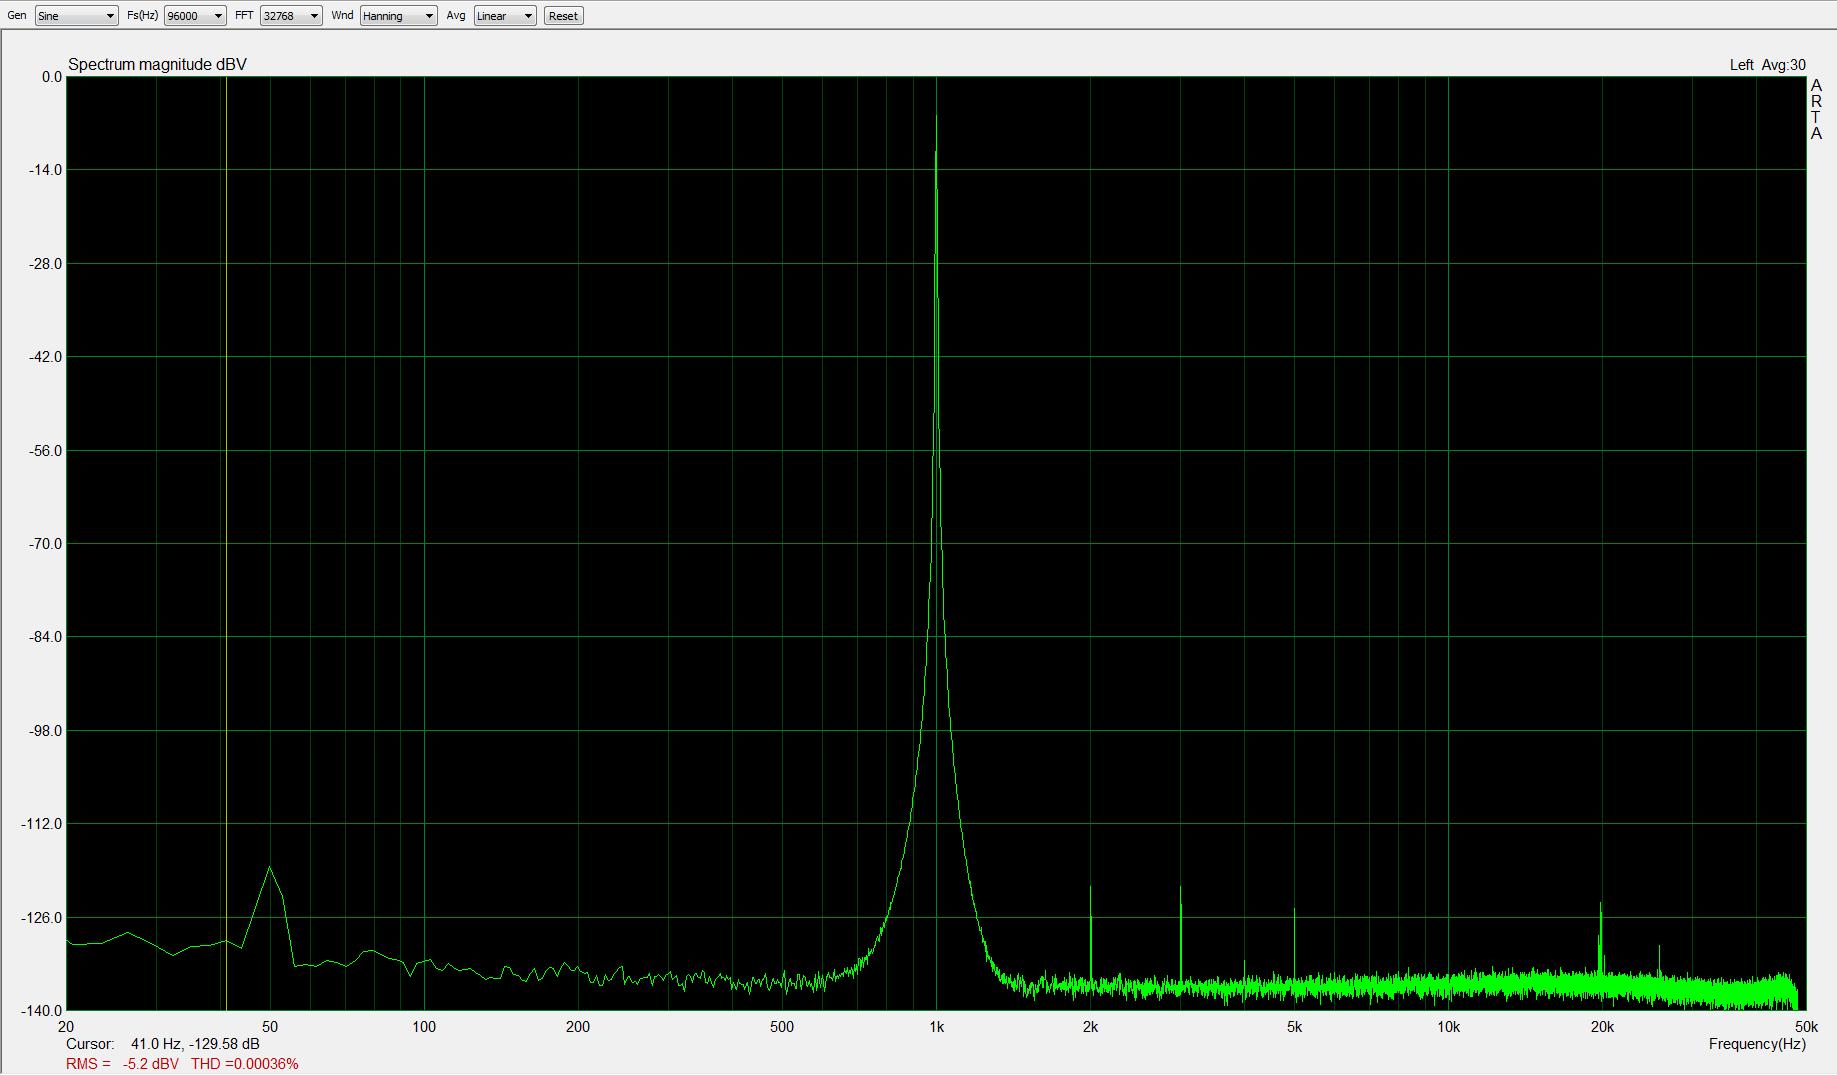 1kHz, -5dBFS, fs=96kHz; THD < 0,0004%